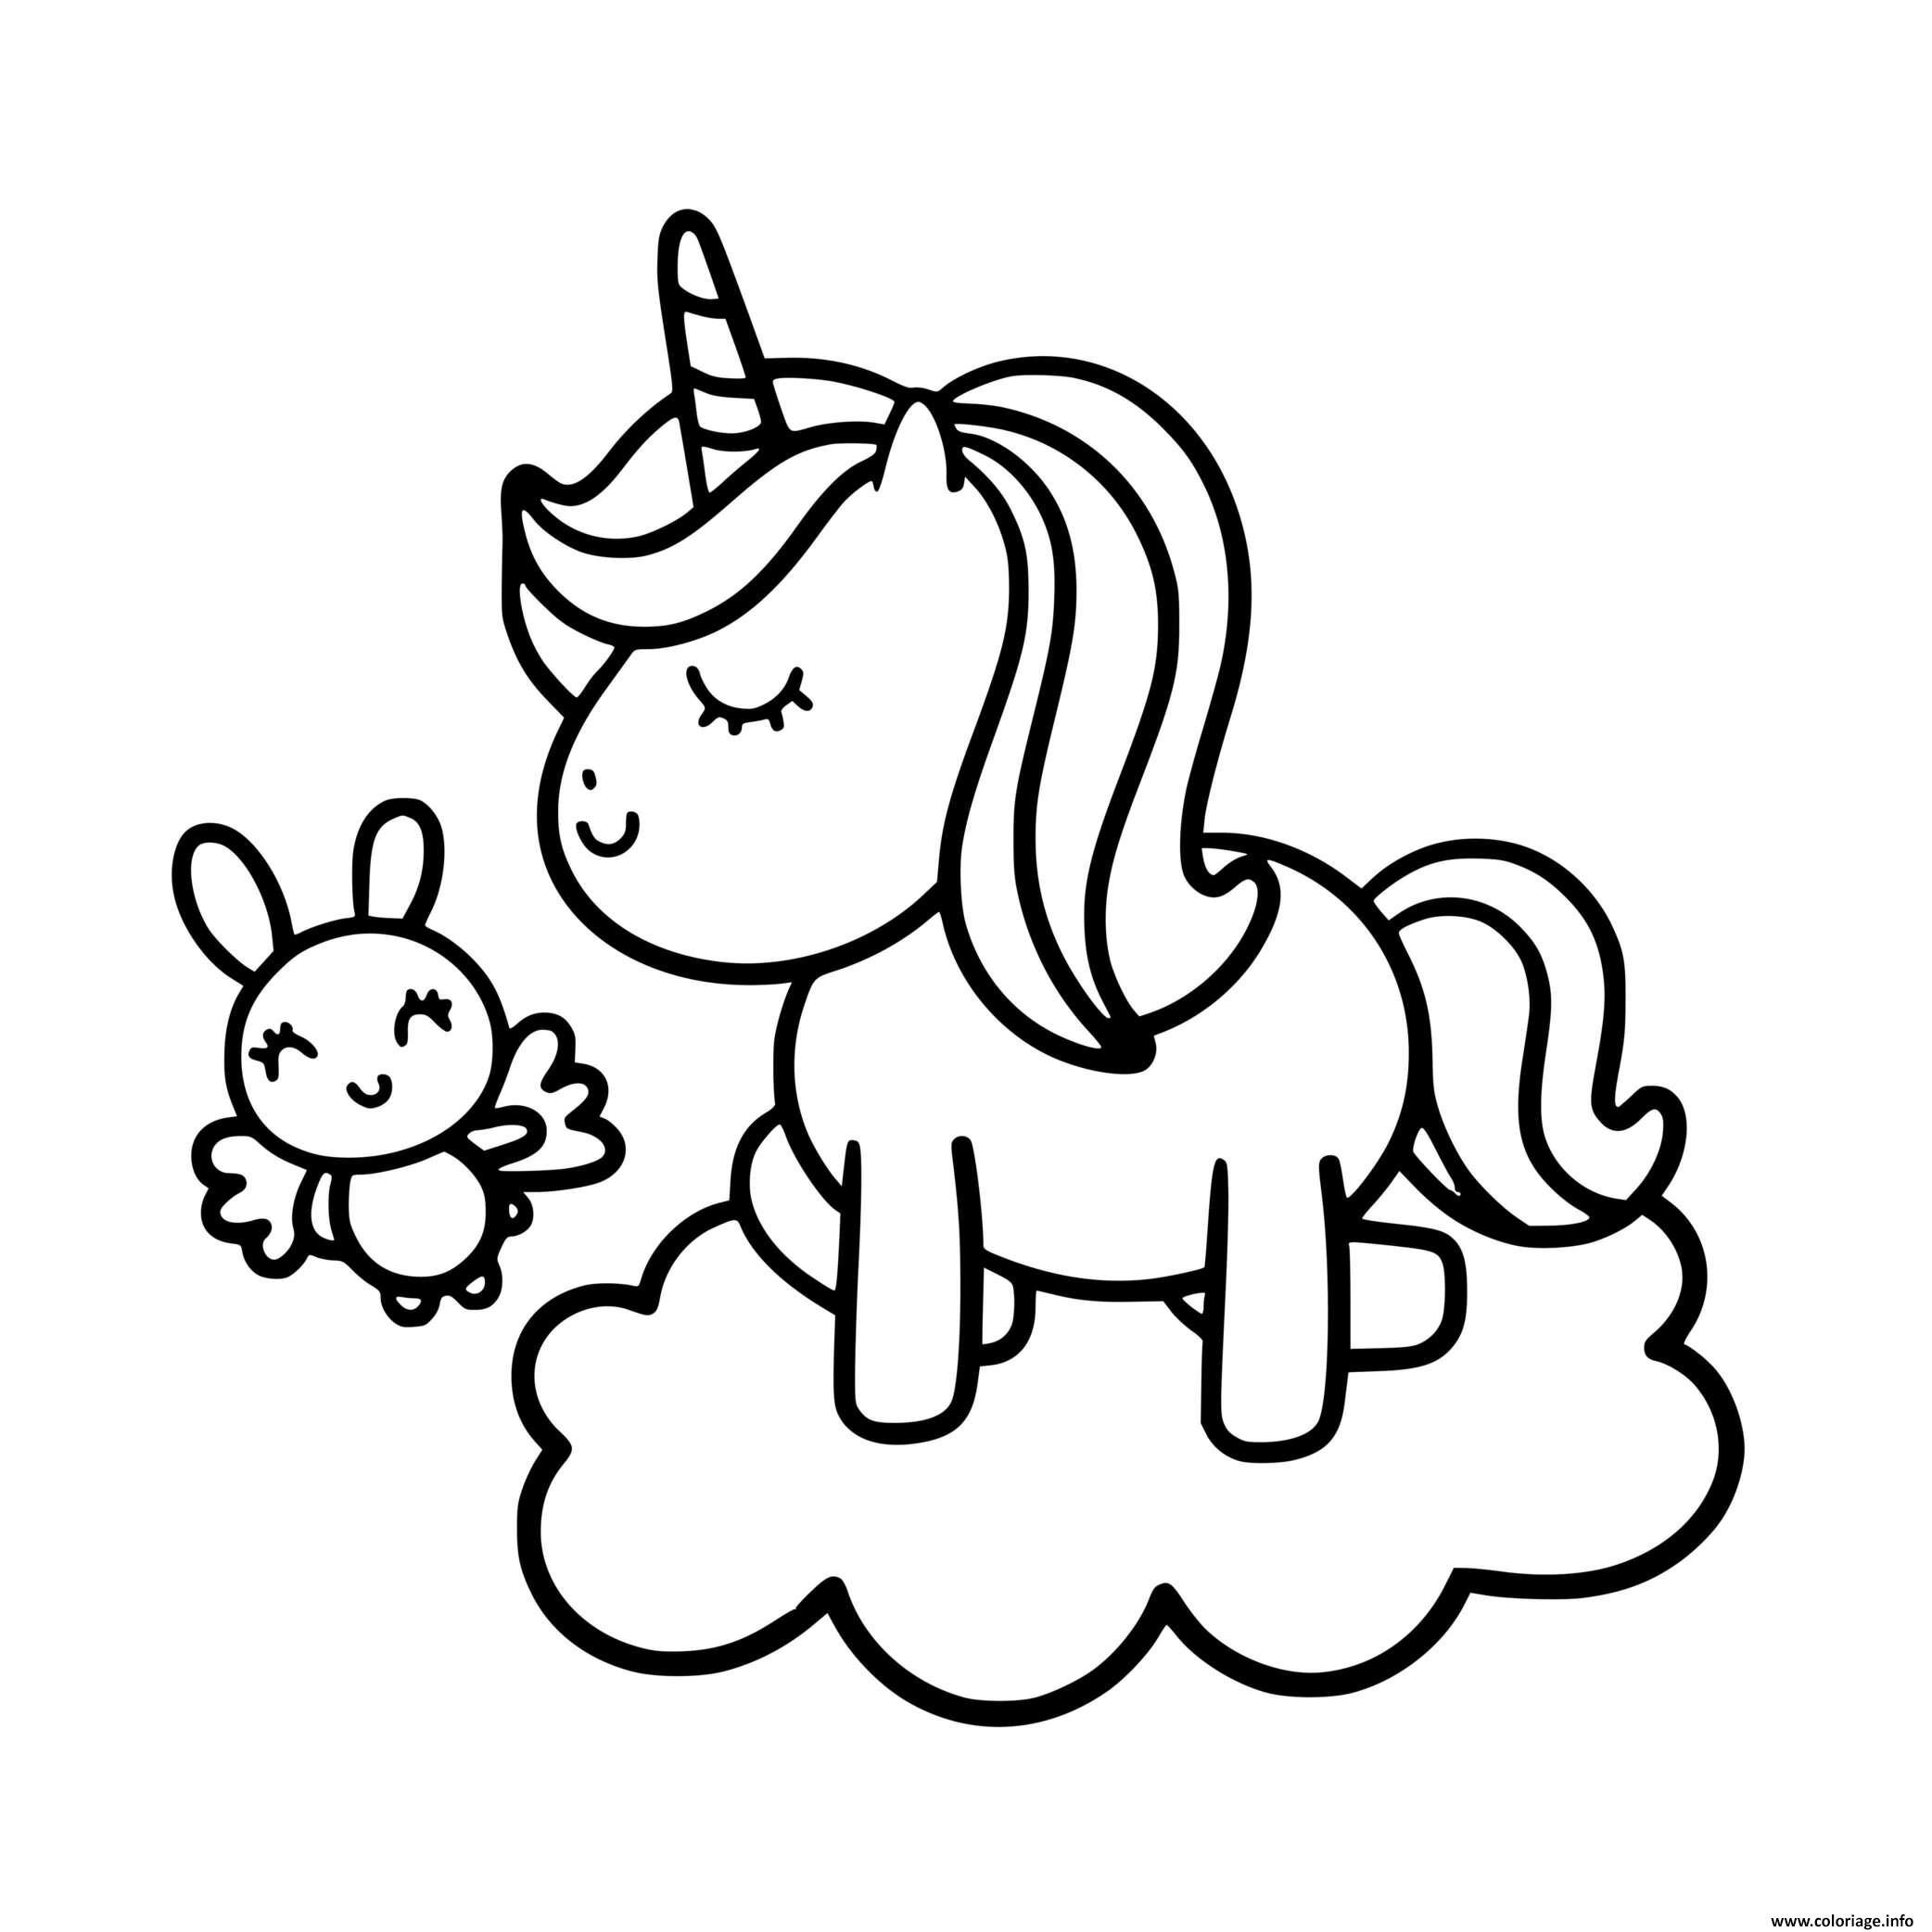 Coloriage Maman Licorne Avec Son Bebe Sur Un Nuage Dessin Licorne A Imprimer